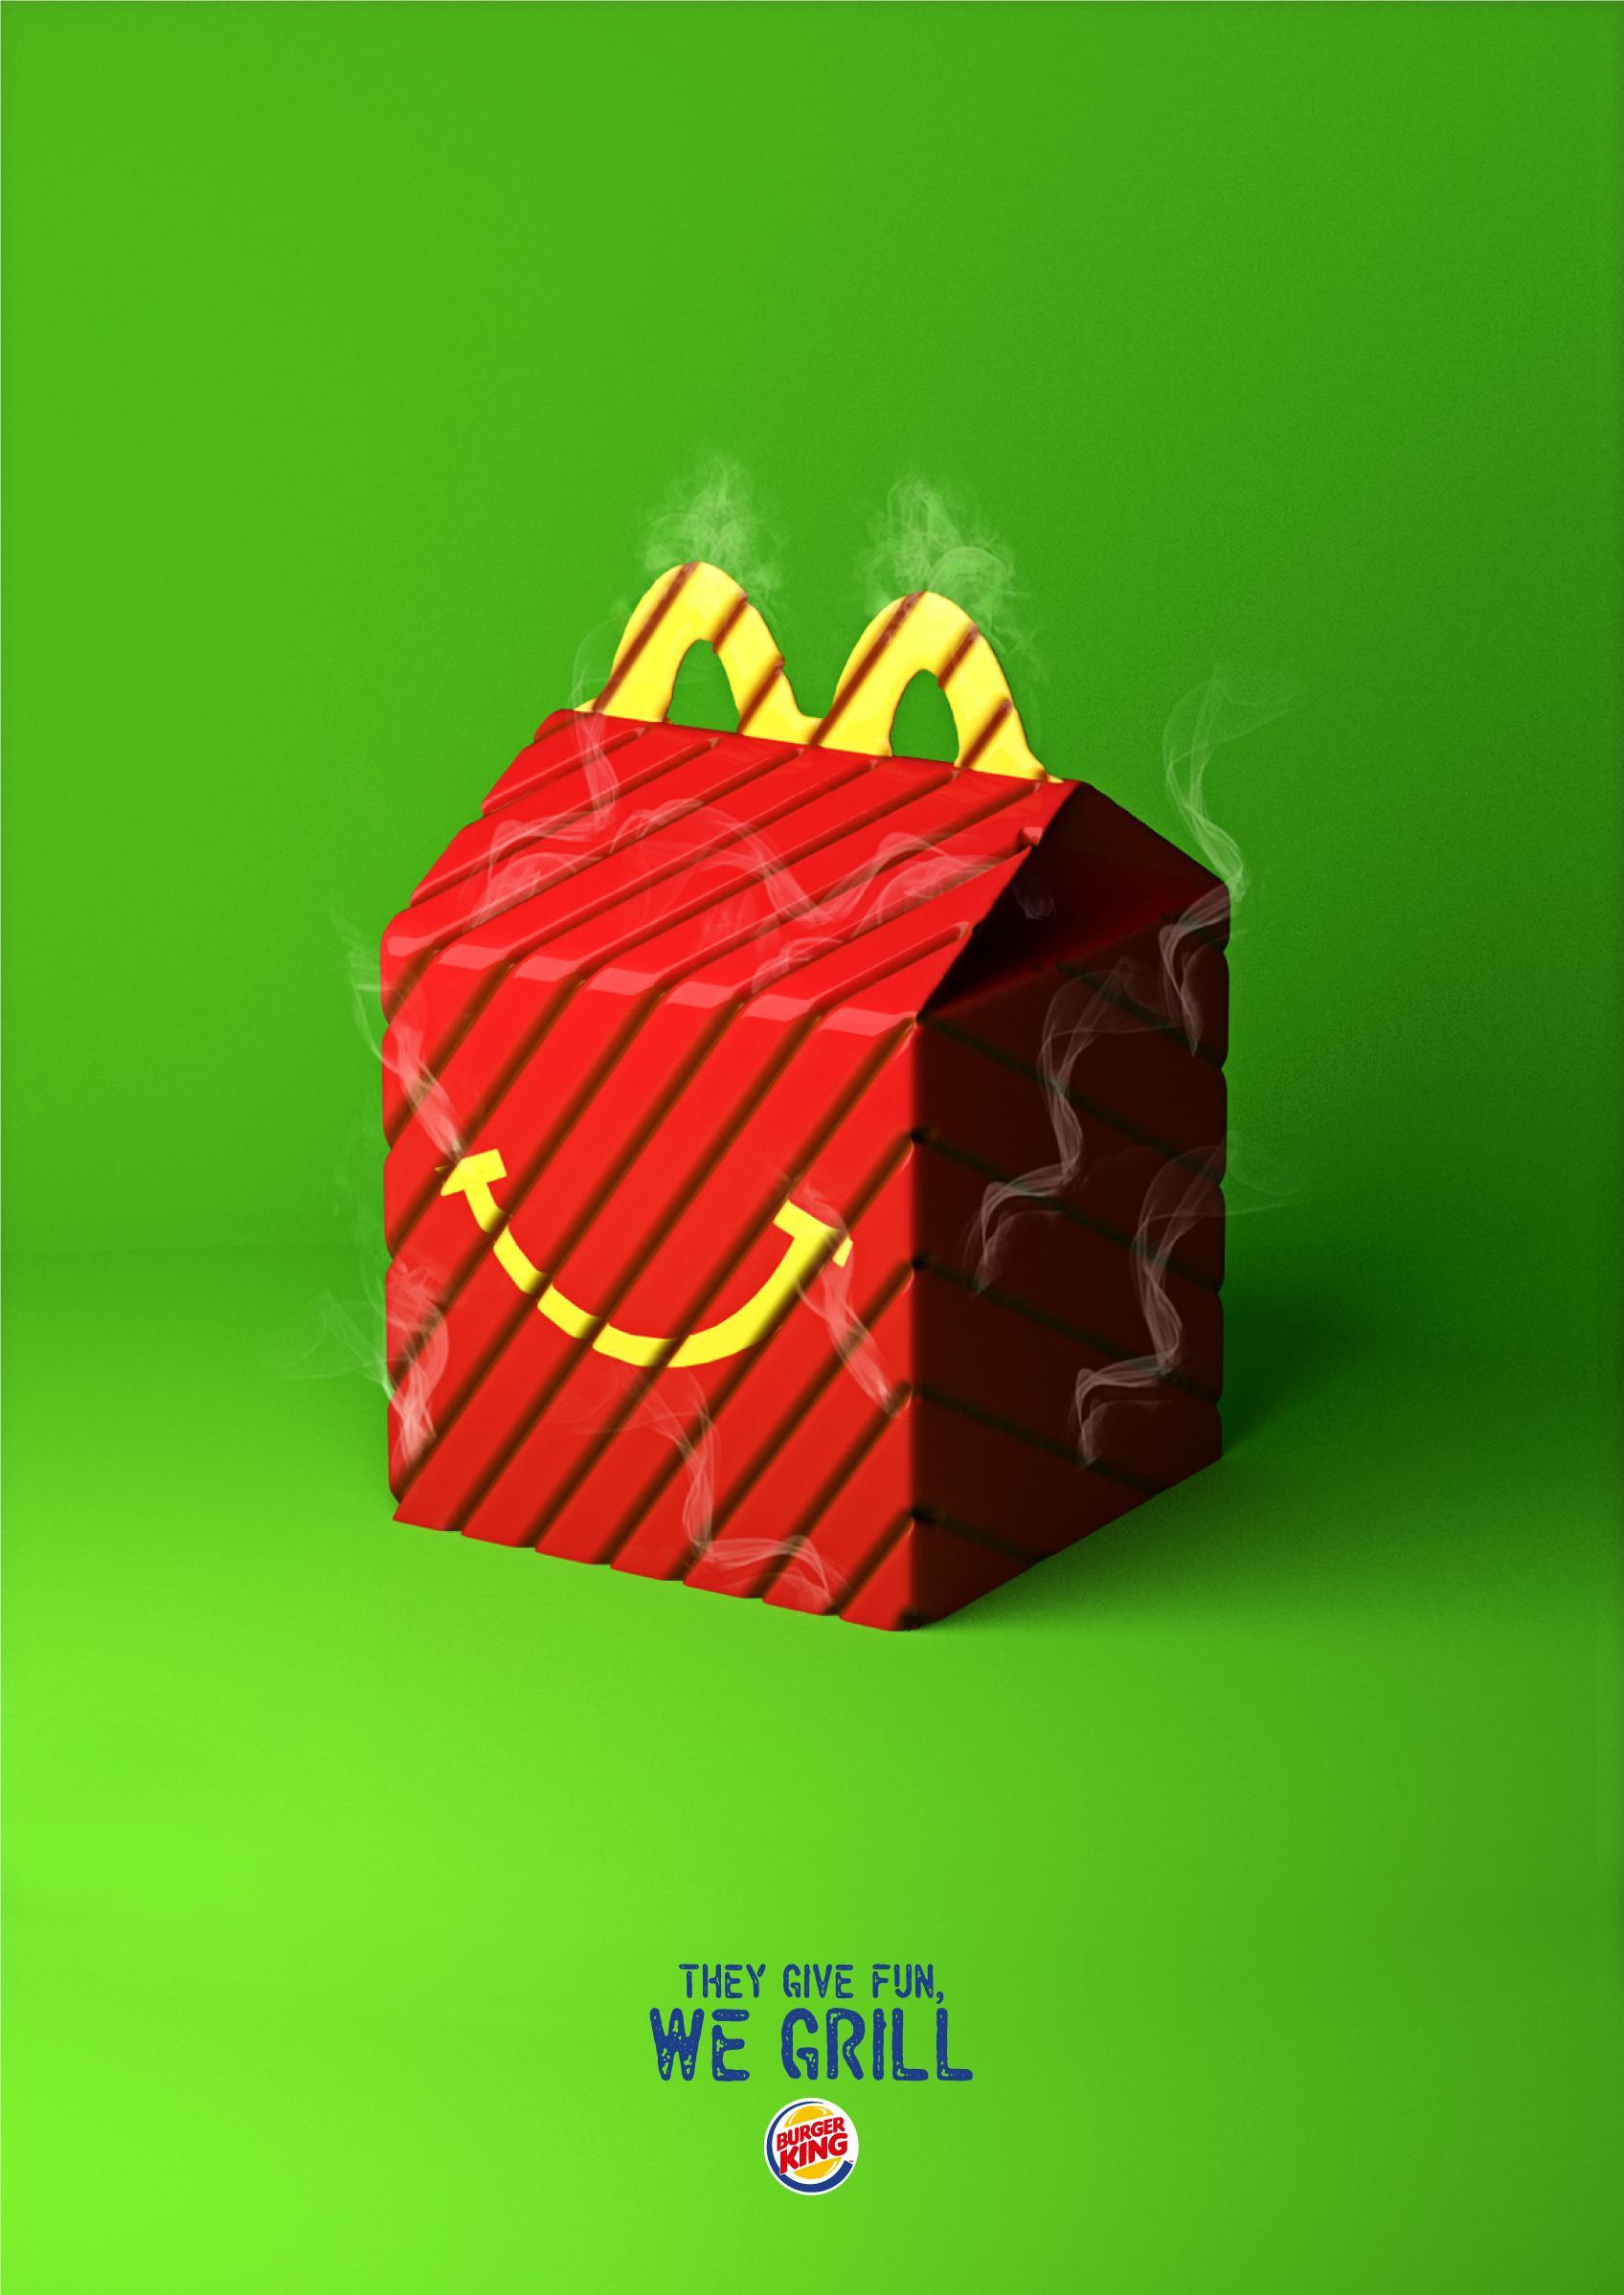 Burger King Print Ad - Friendly Grill, 4